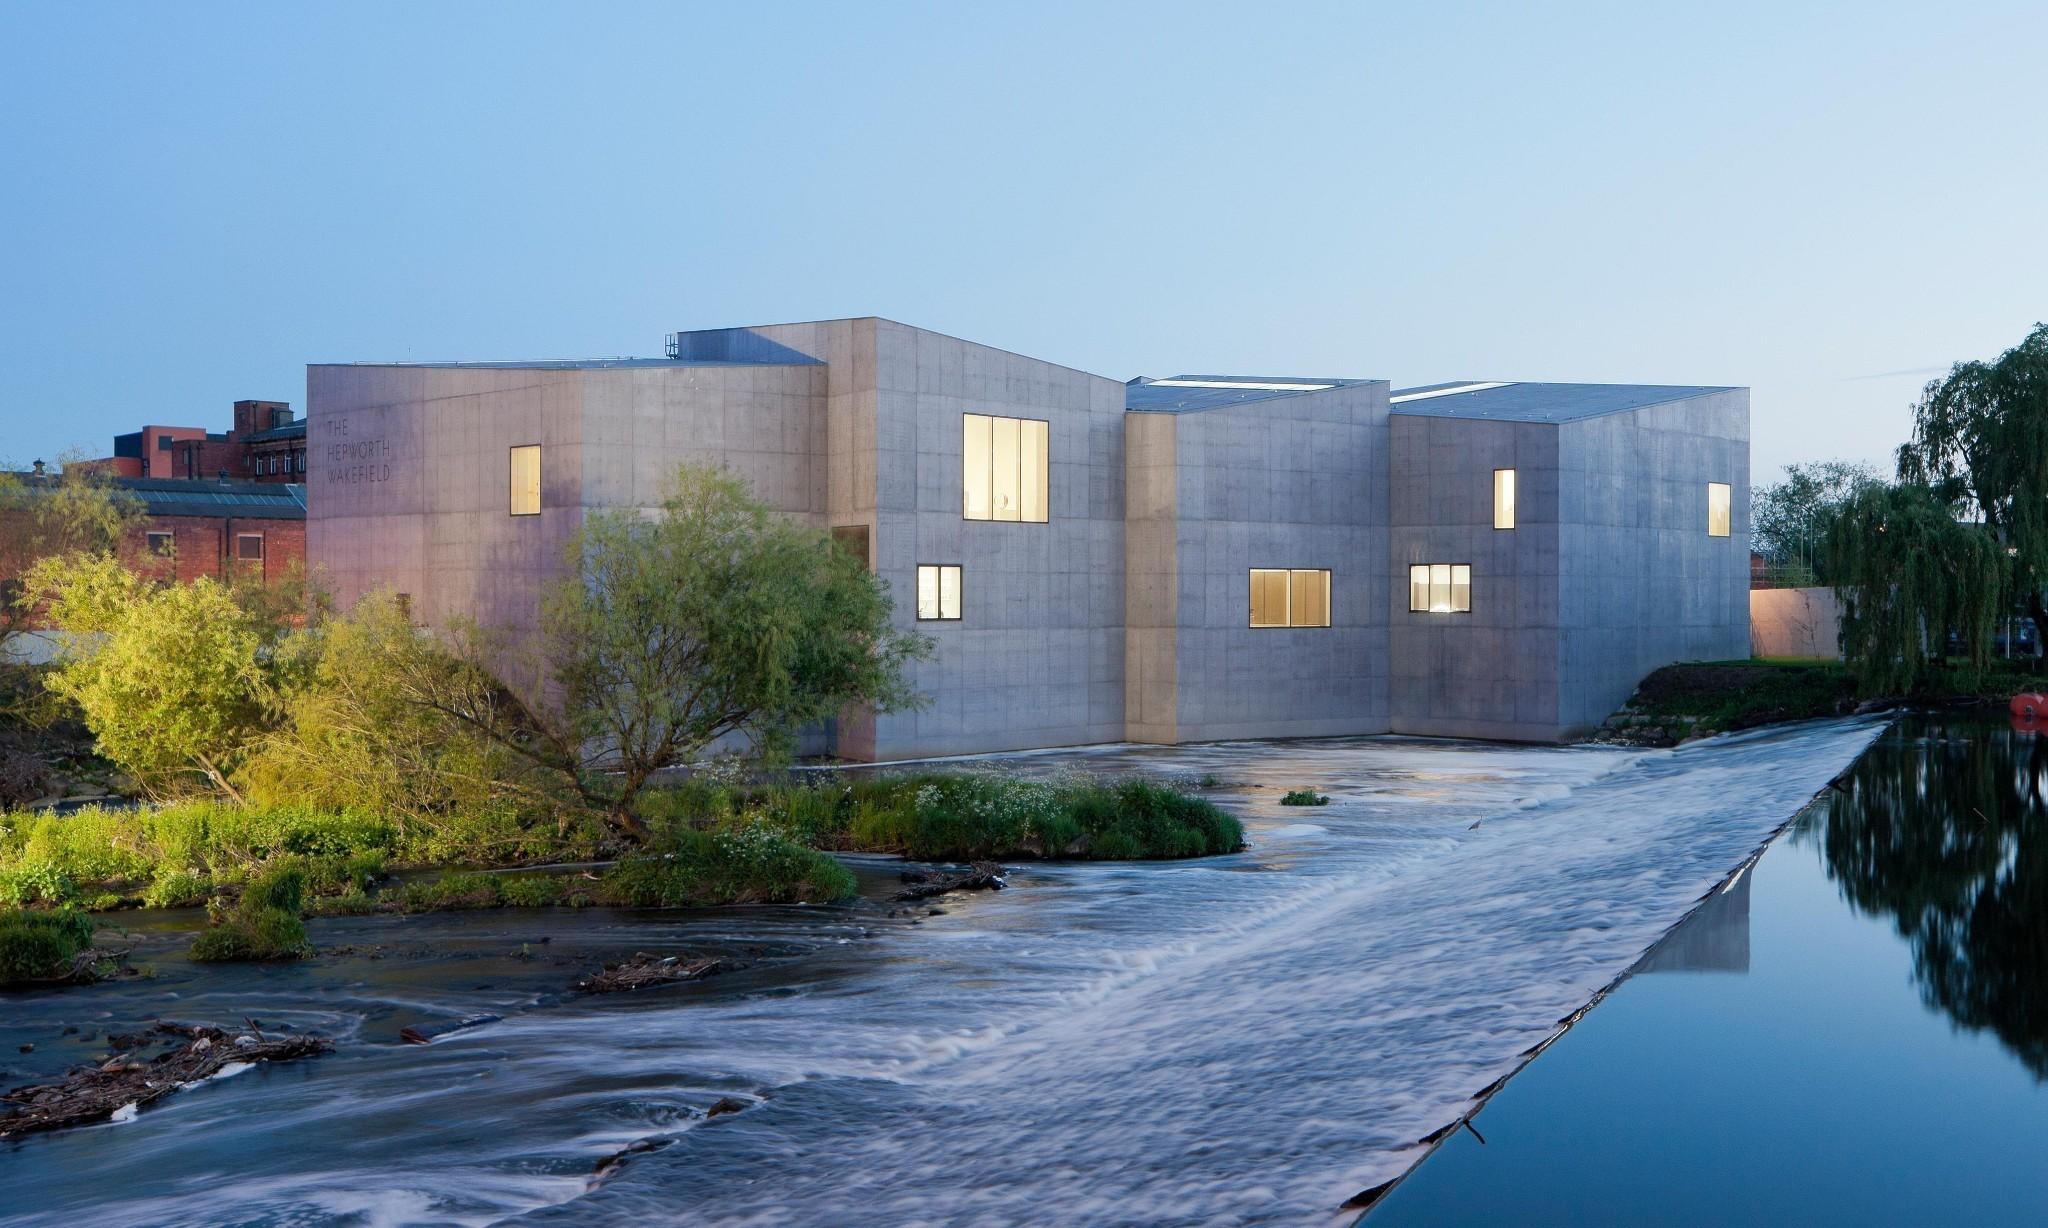 Hepworth Wakefield art gallery wins museum of the year award